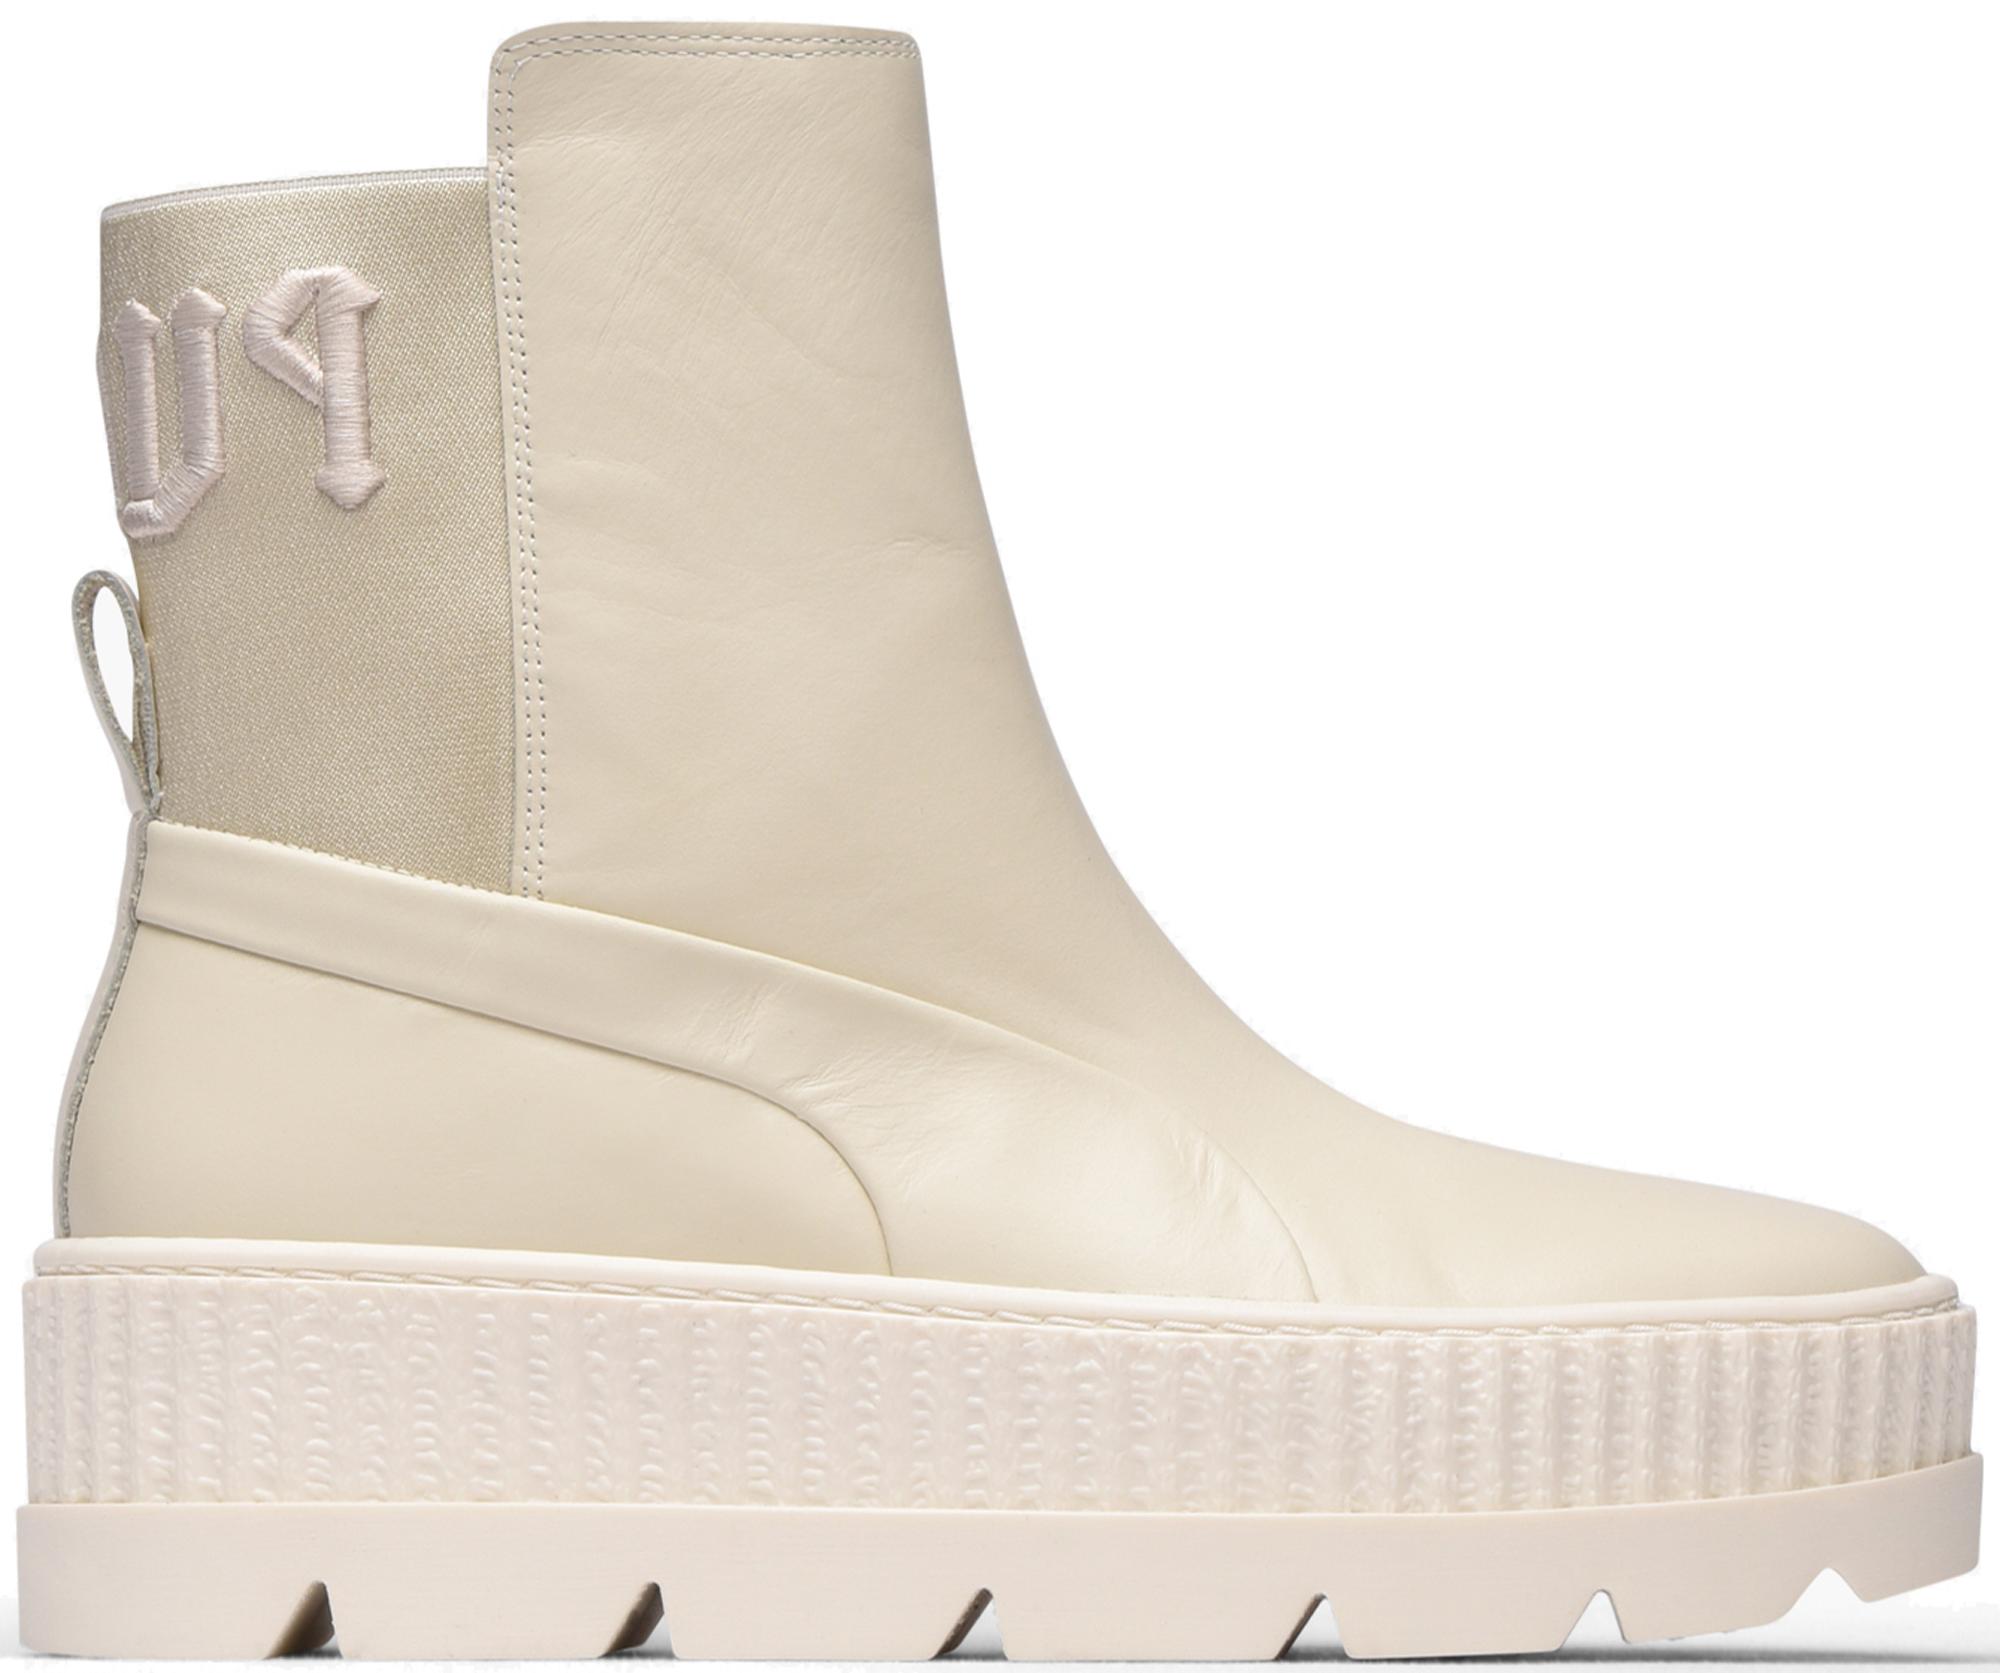 Puma Chelsea Sneaker Boot Rihanna Fenty Vanilla Ice (W)